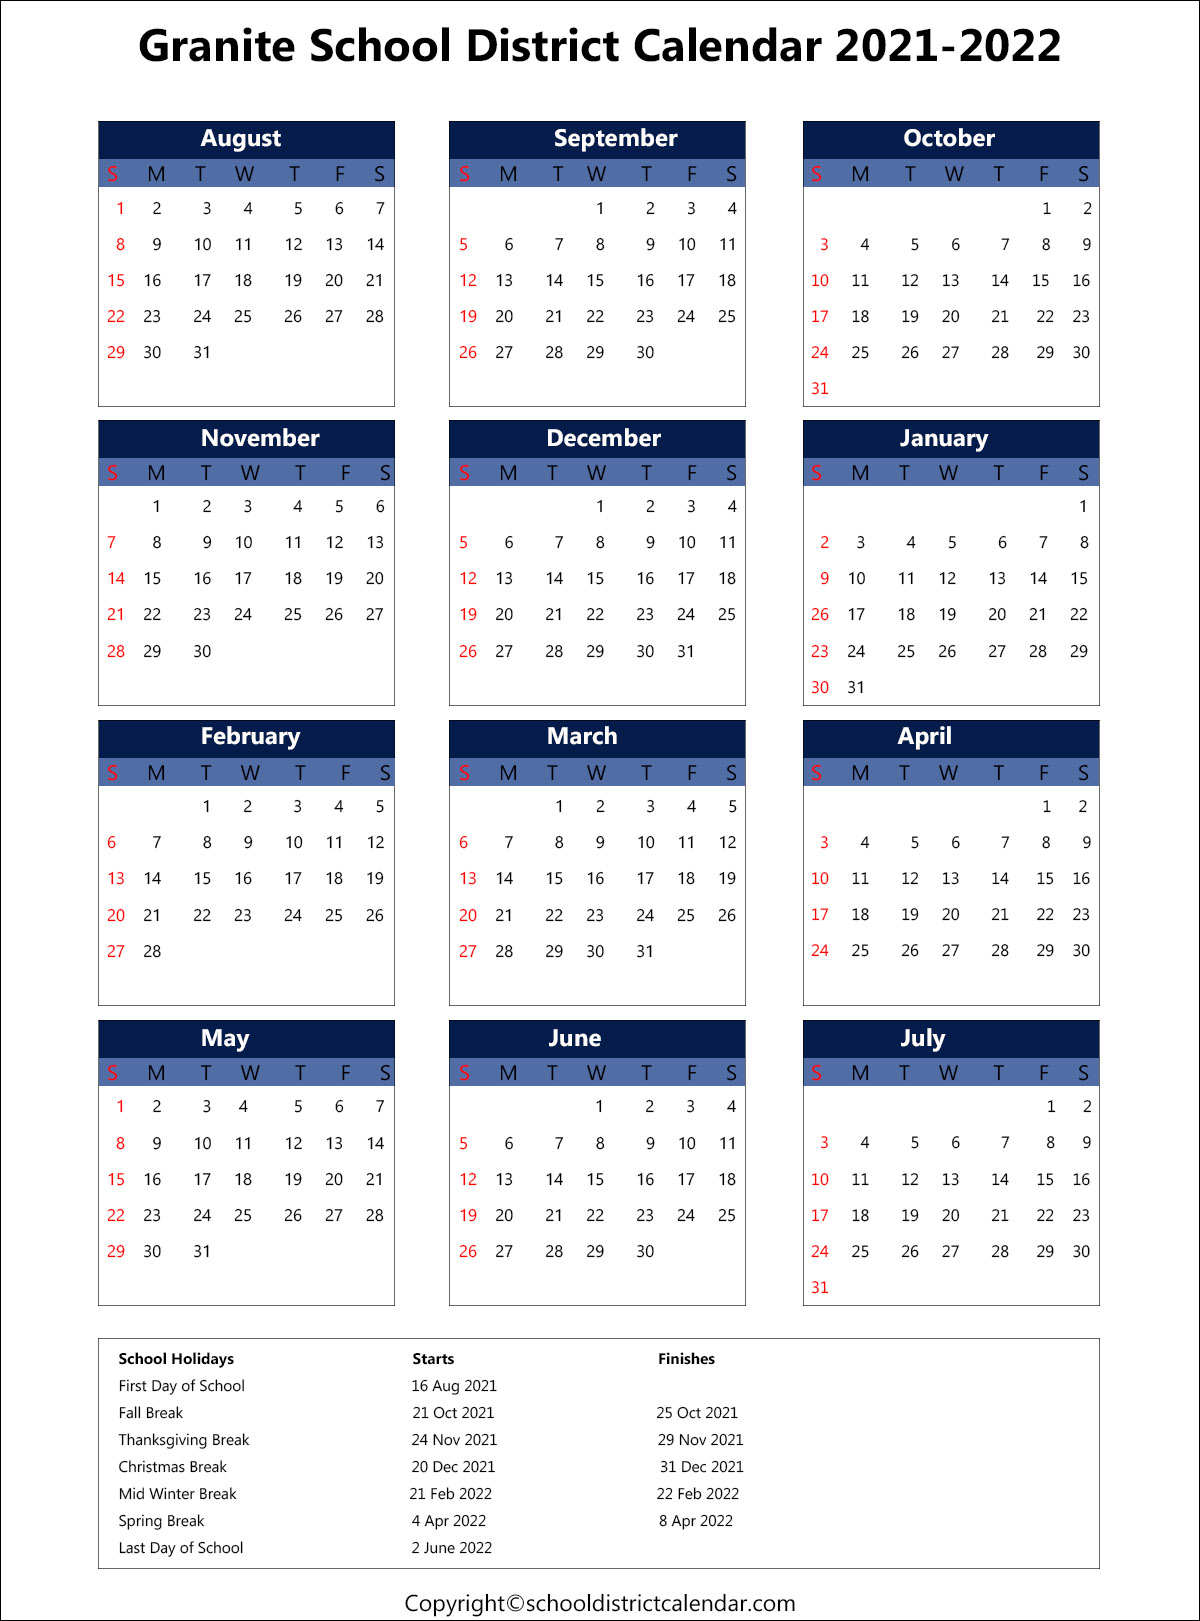 Granite School District Calendar 2021